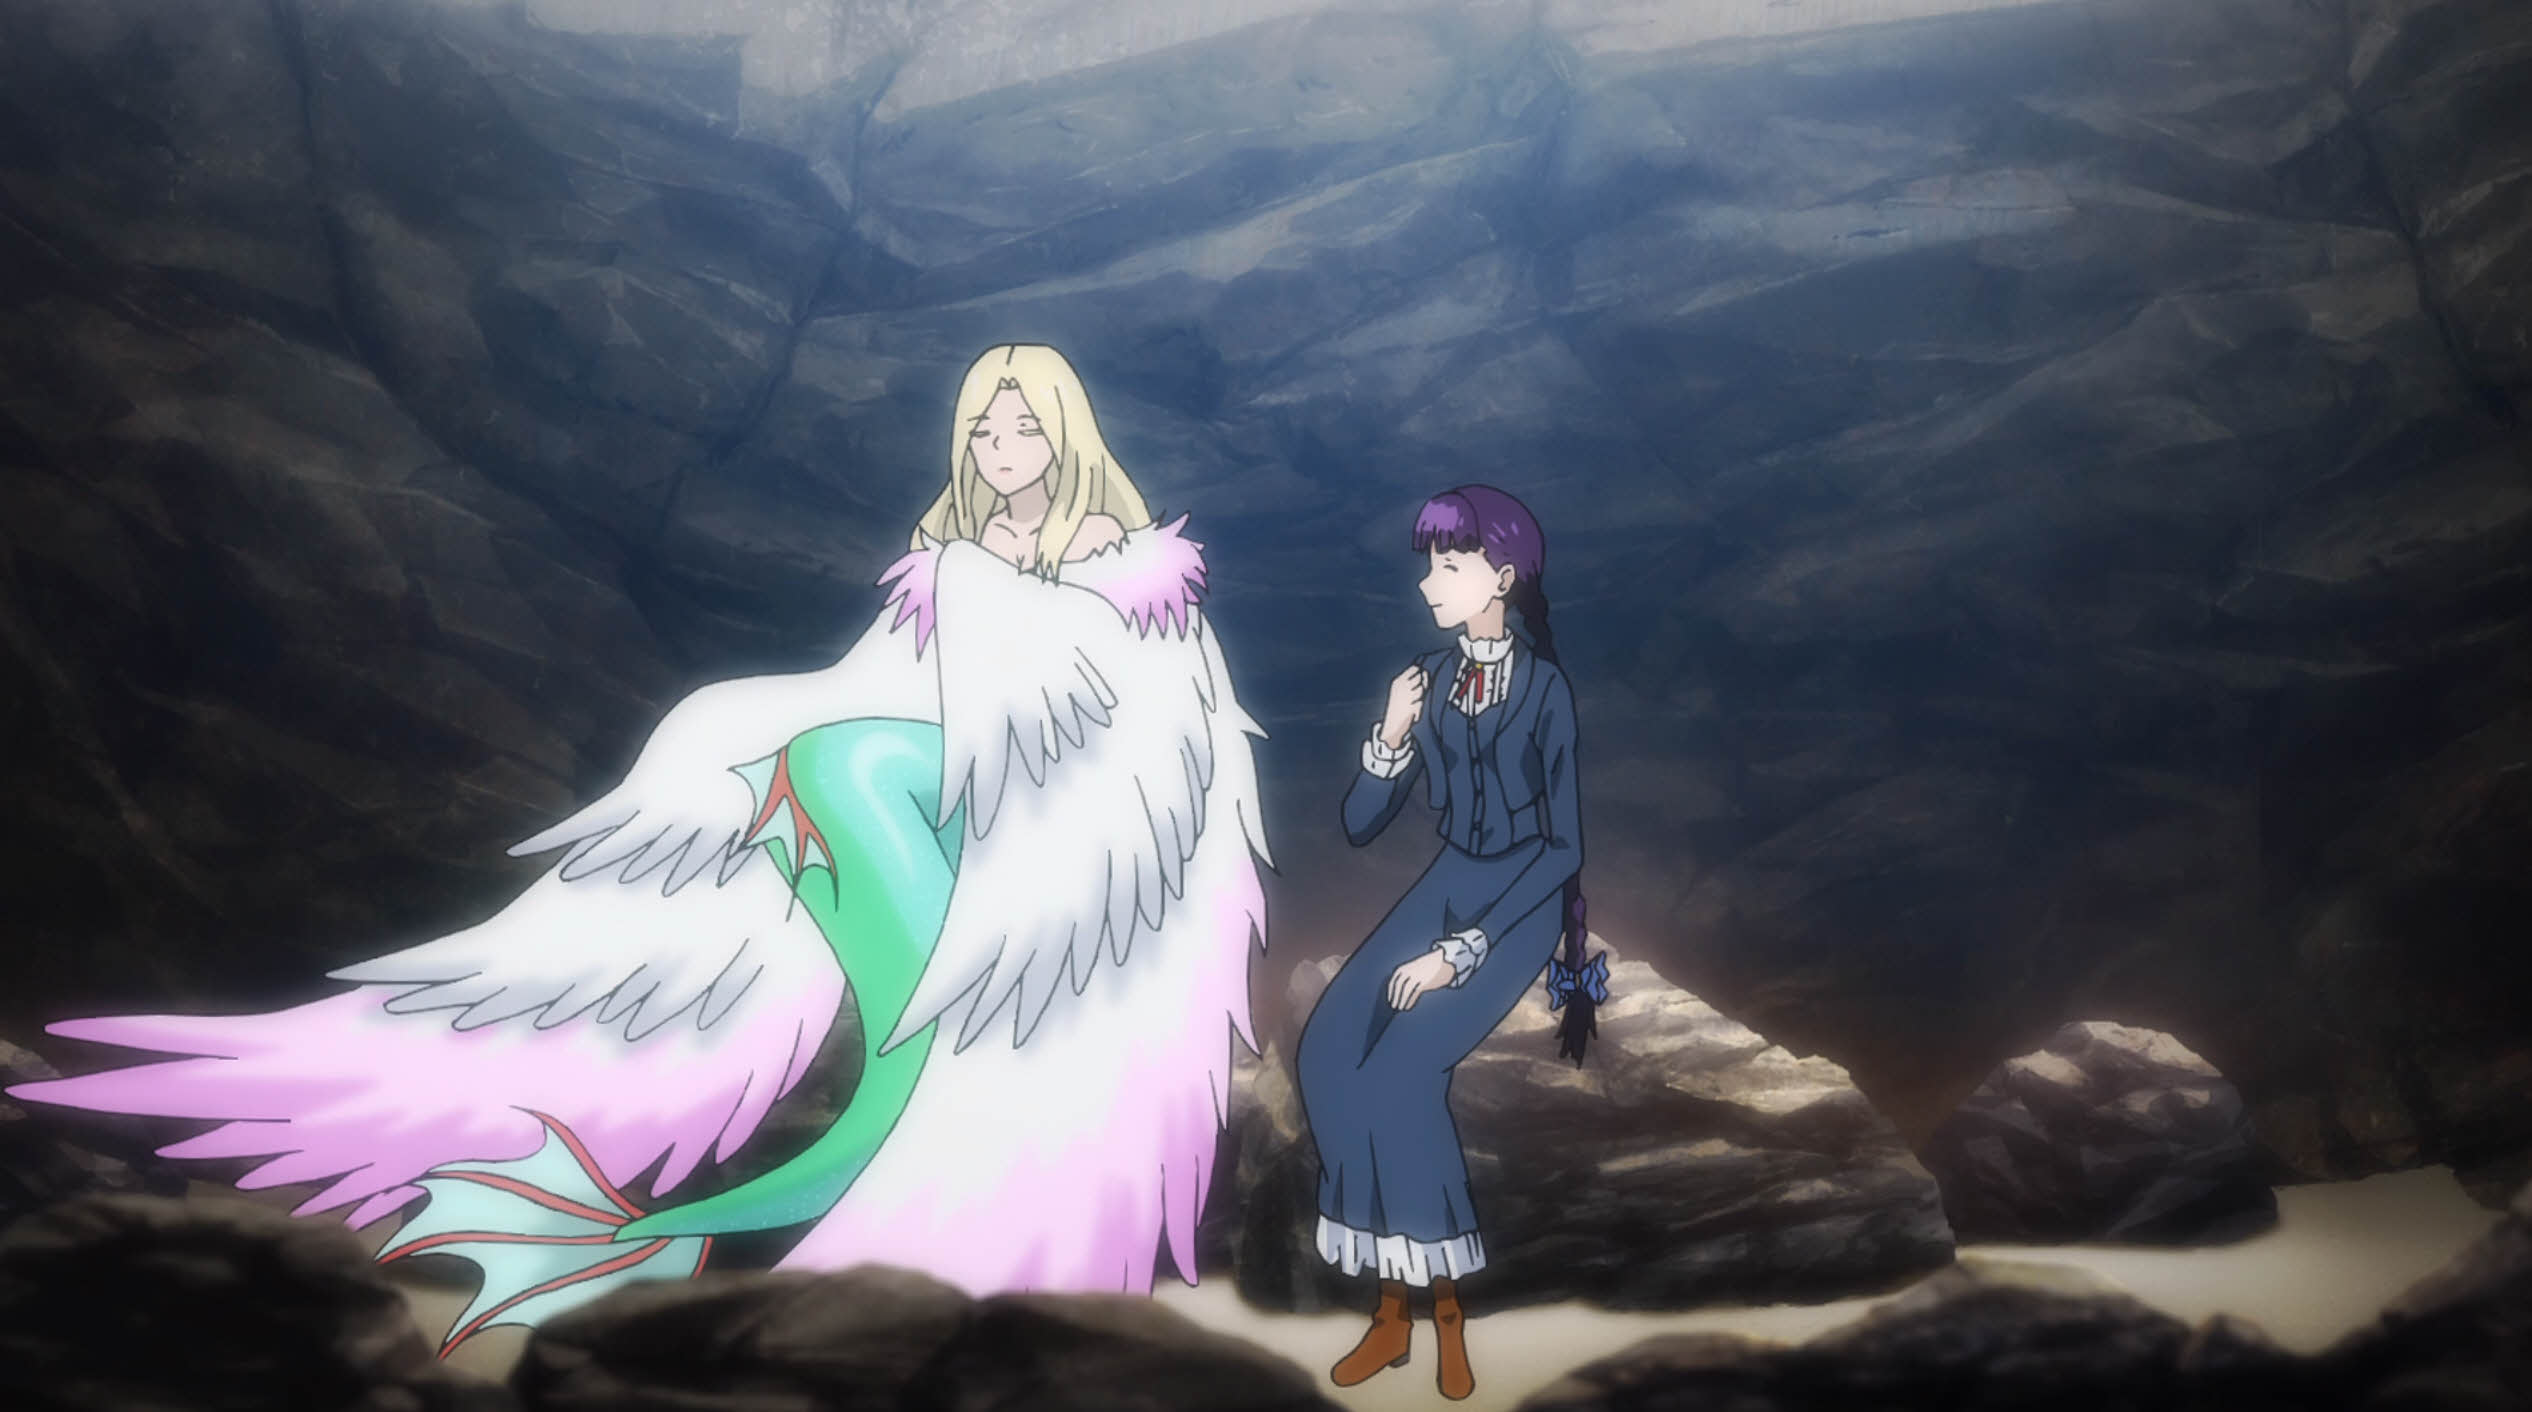 Flying mermaid and friend